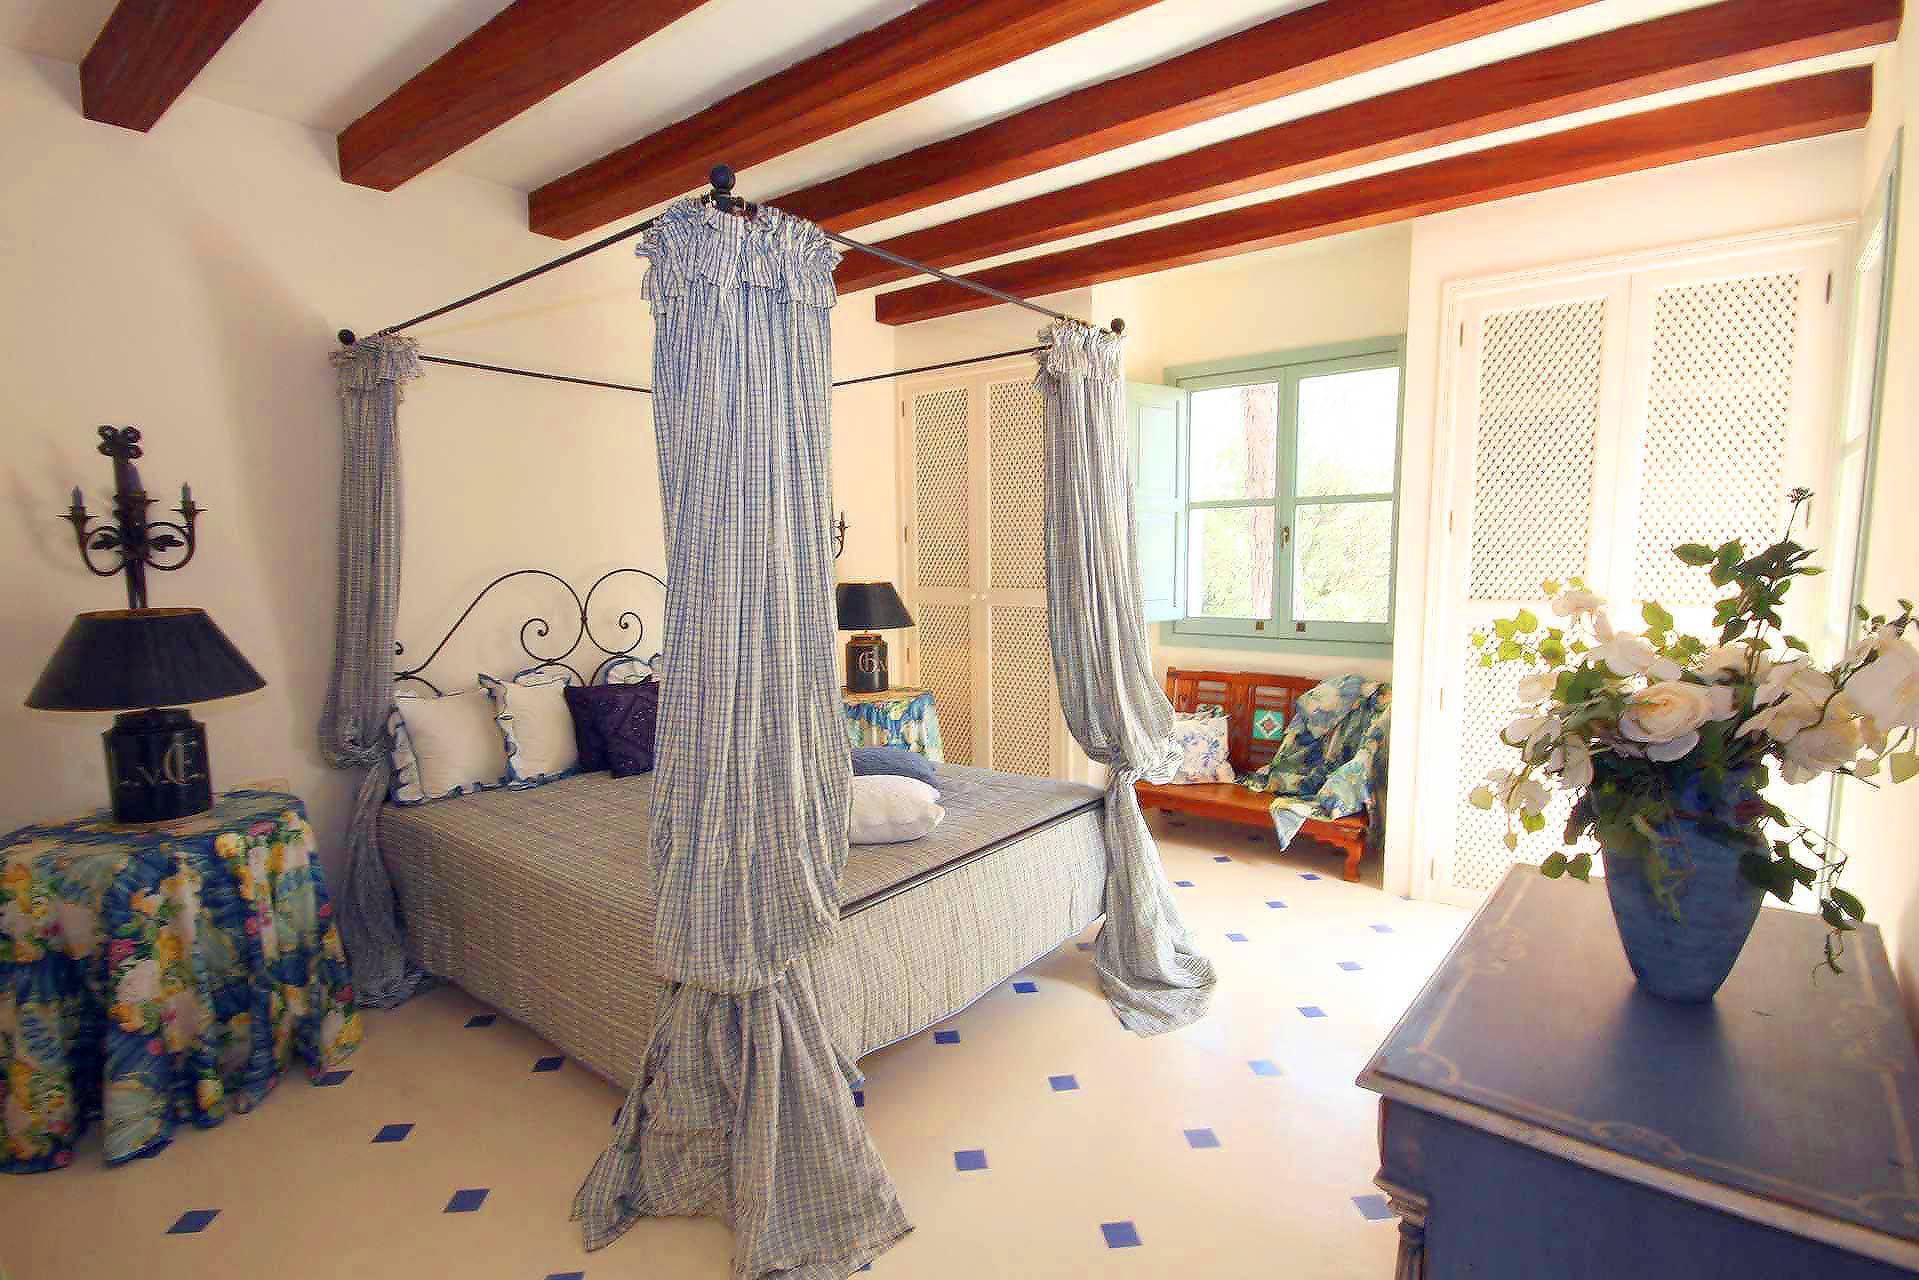 01-98 Extravagantes Ferienhaus Mallorca Osten Bild 26